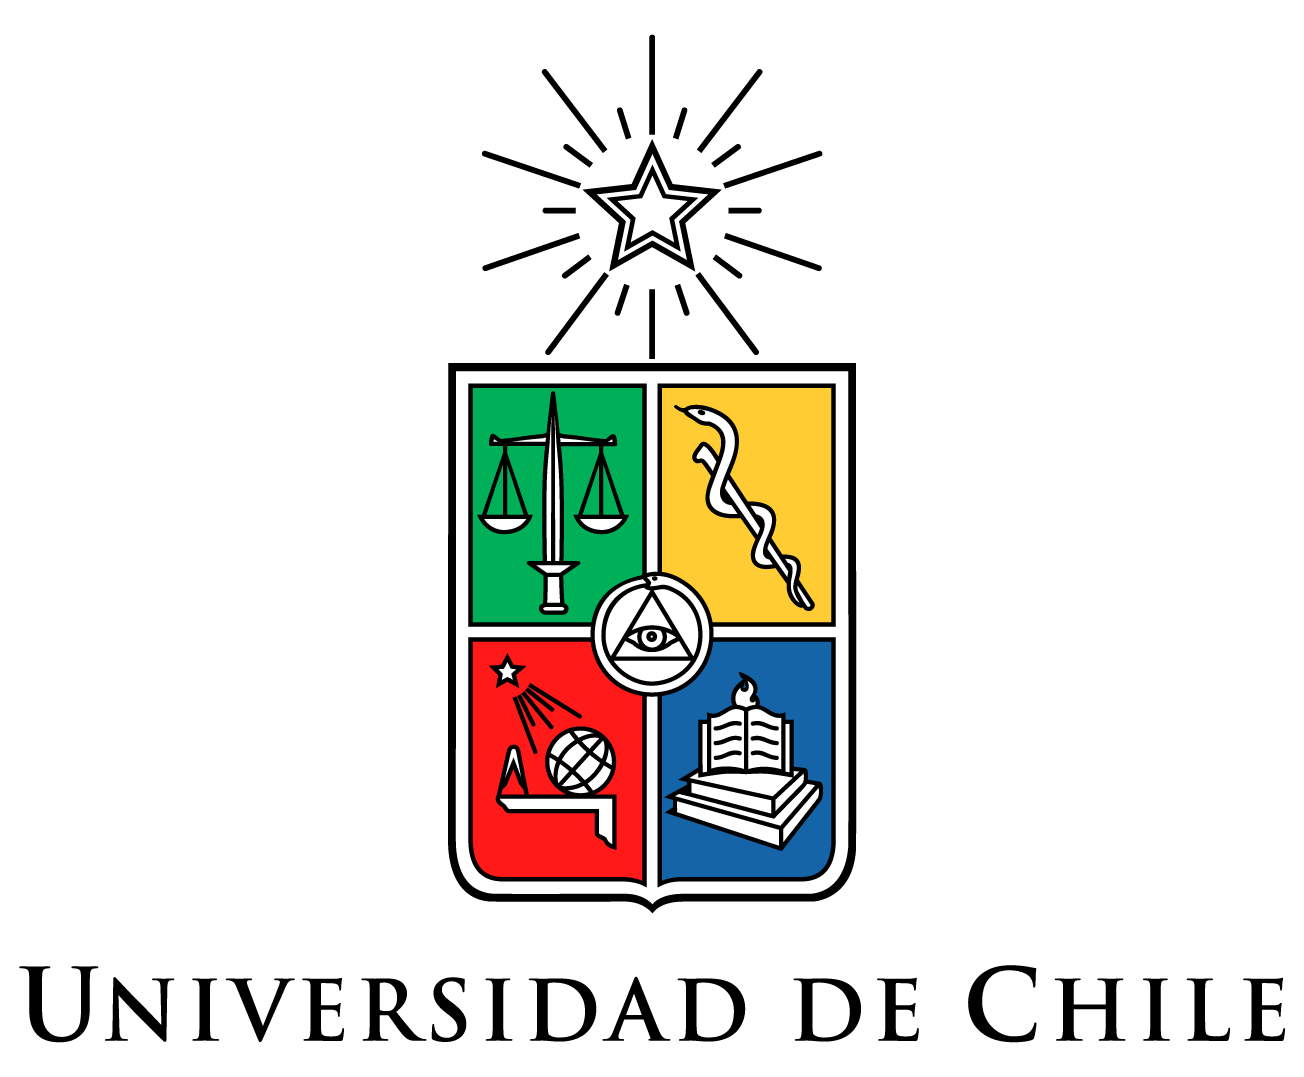 Universidad de chile puntajes de corte 2016 qu for Casa musica chile